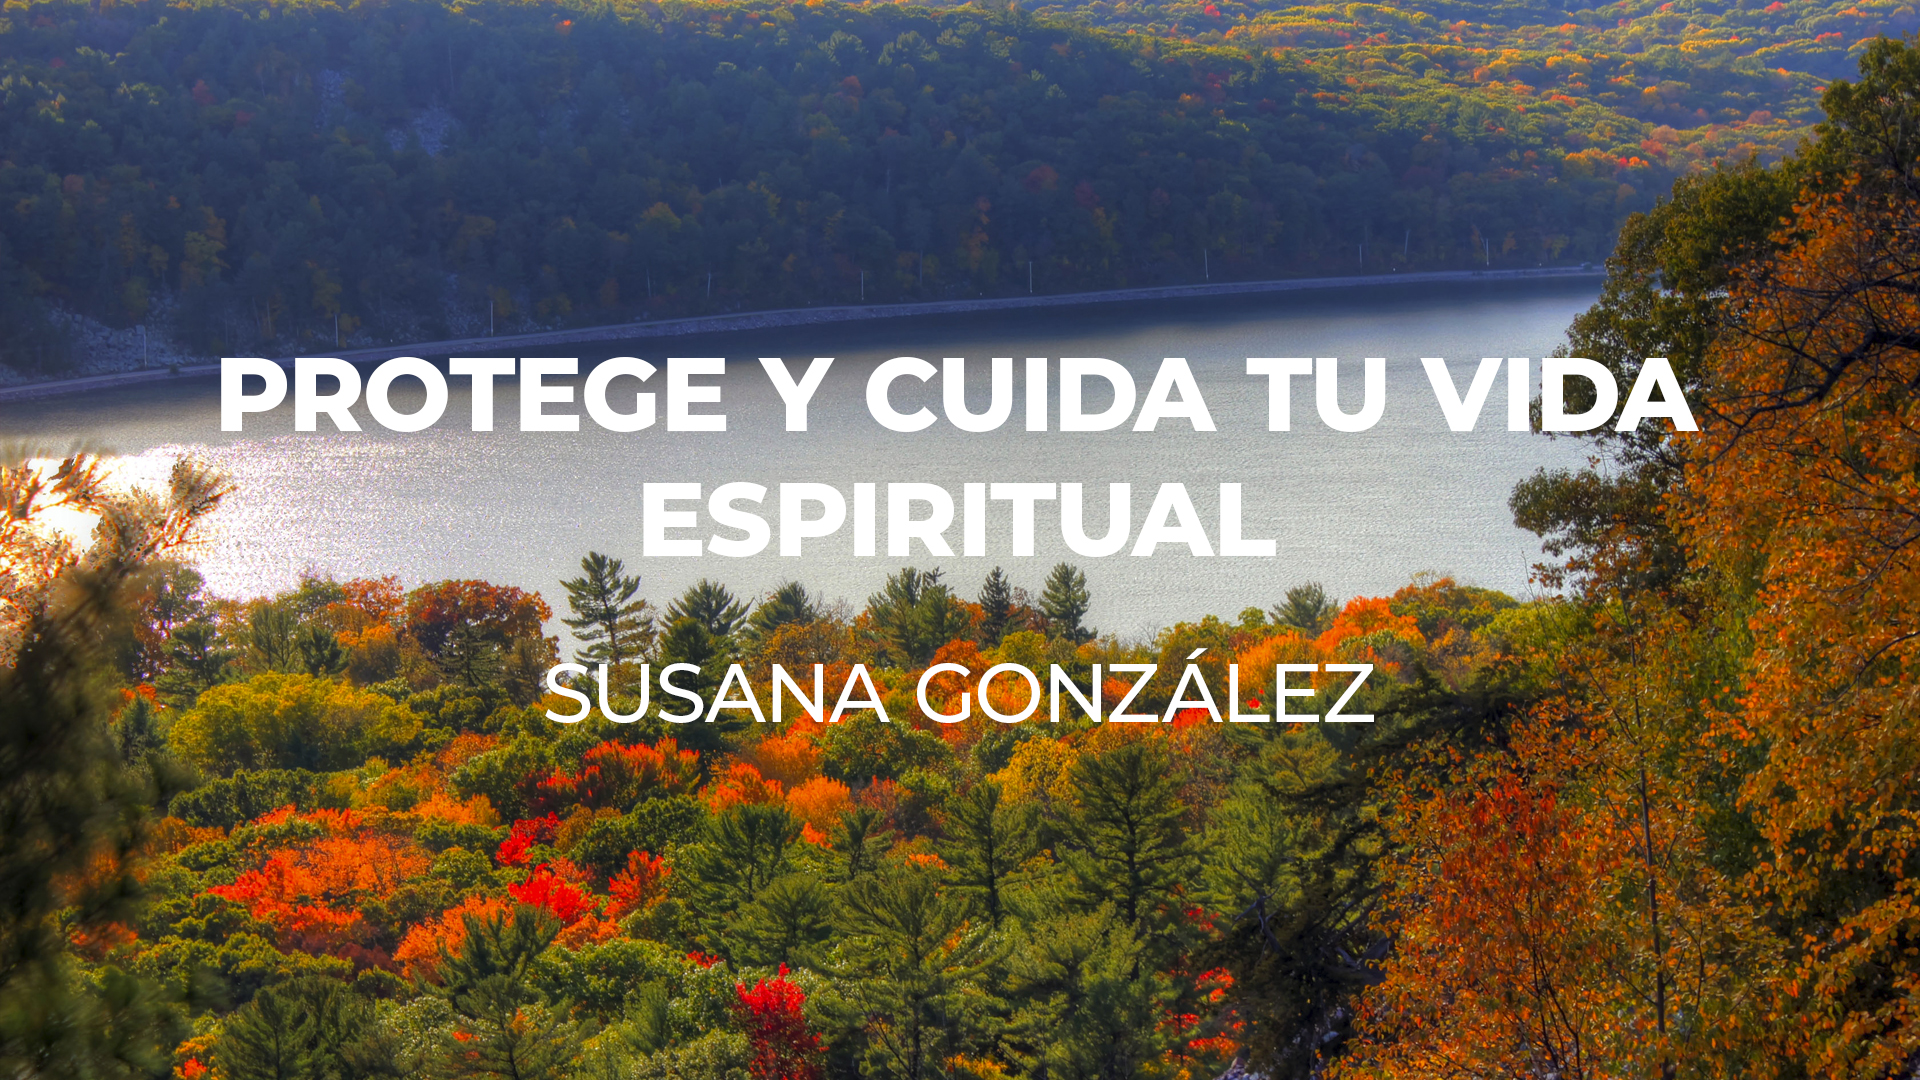 Protege y cuida tu vida espiritual | Susana González